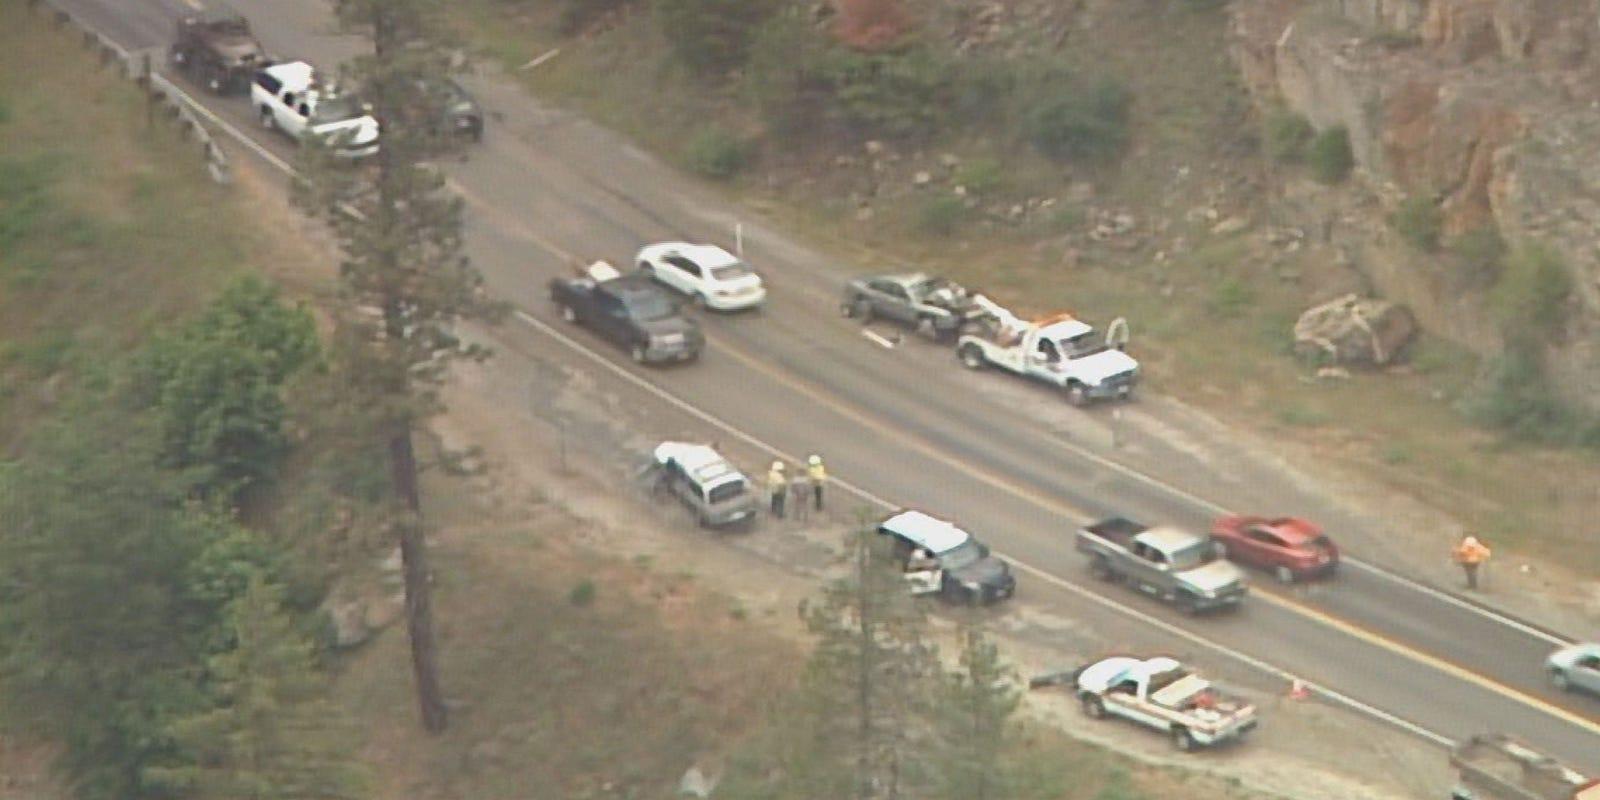 CHP investigates fatal crash on Hwy  50